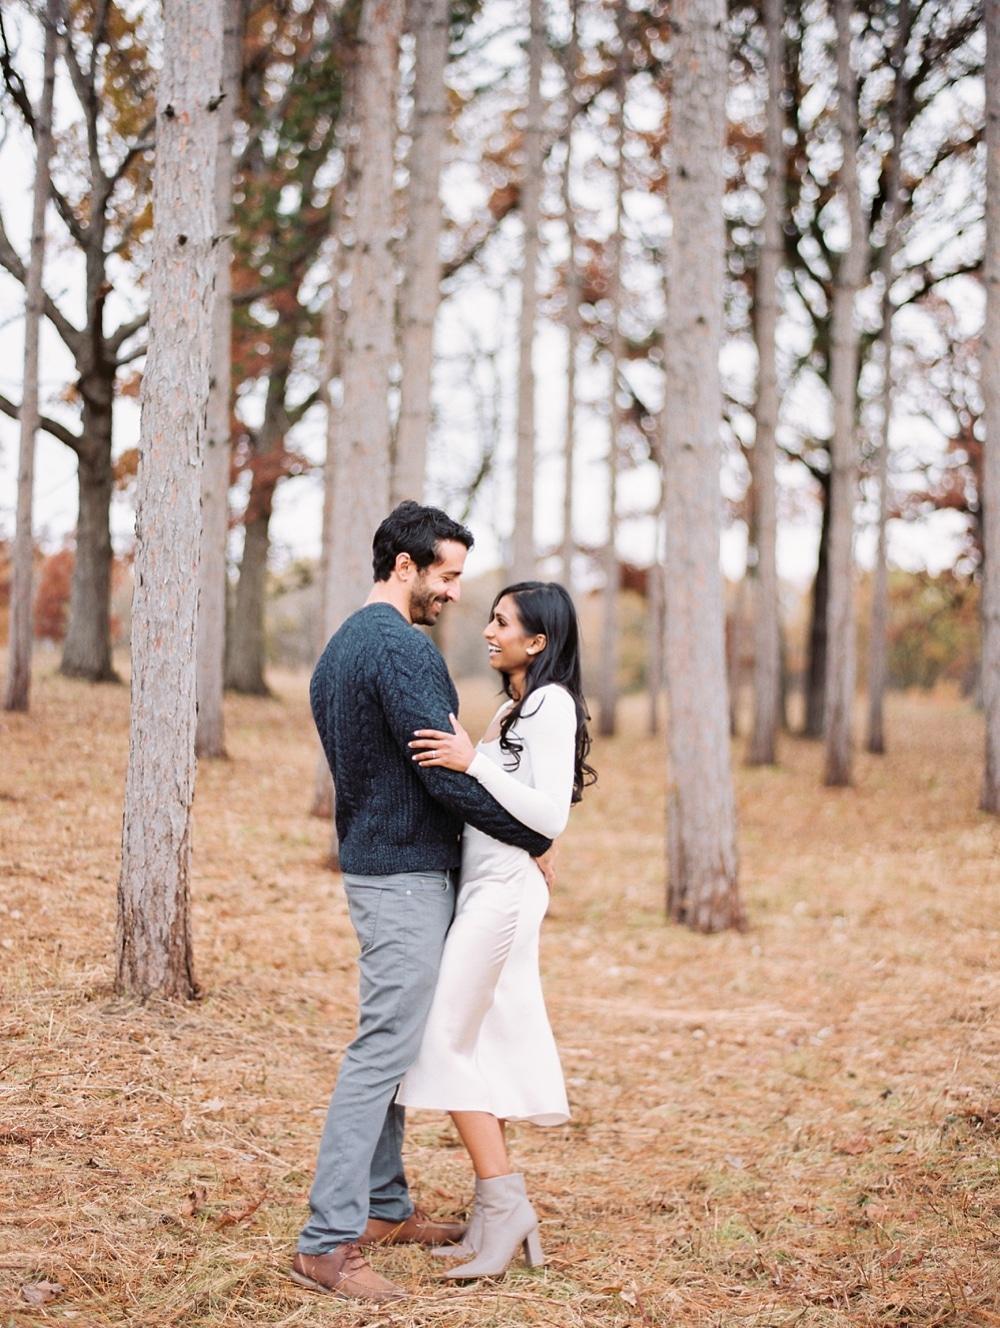 Kristin-La-Voie-Photography-morton-arboretum-chicago-wedding-photographer-6